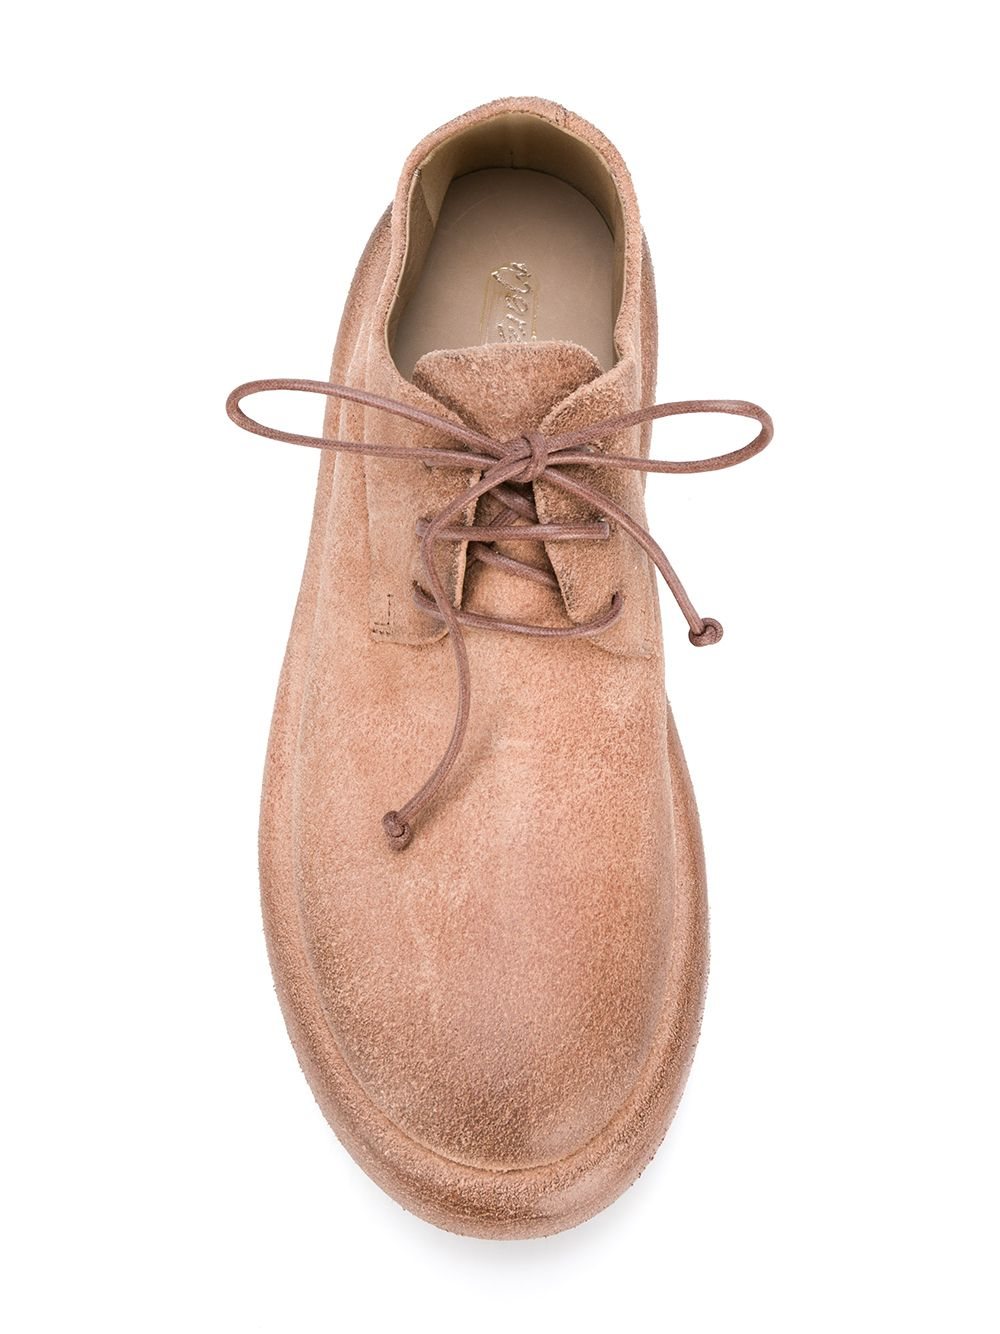 Marsèll | flatform lace-up shoes | Clouty